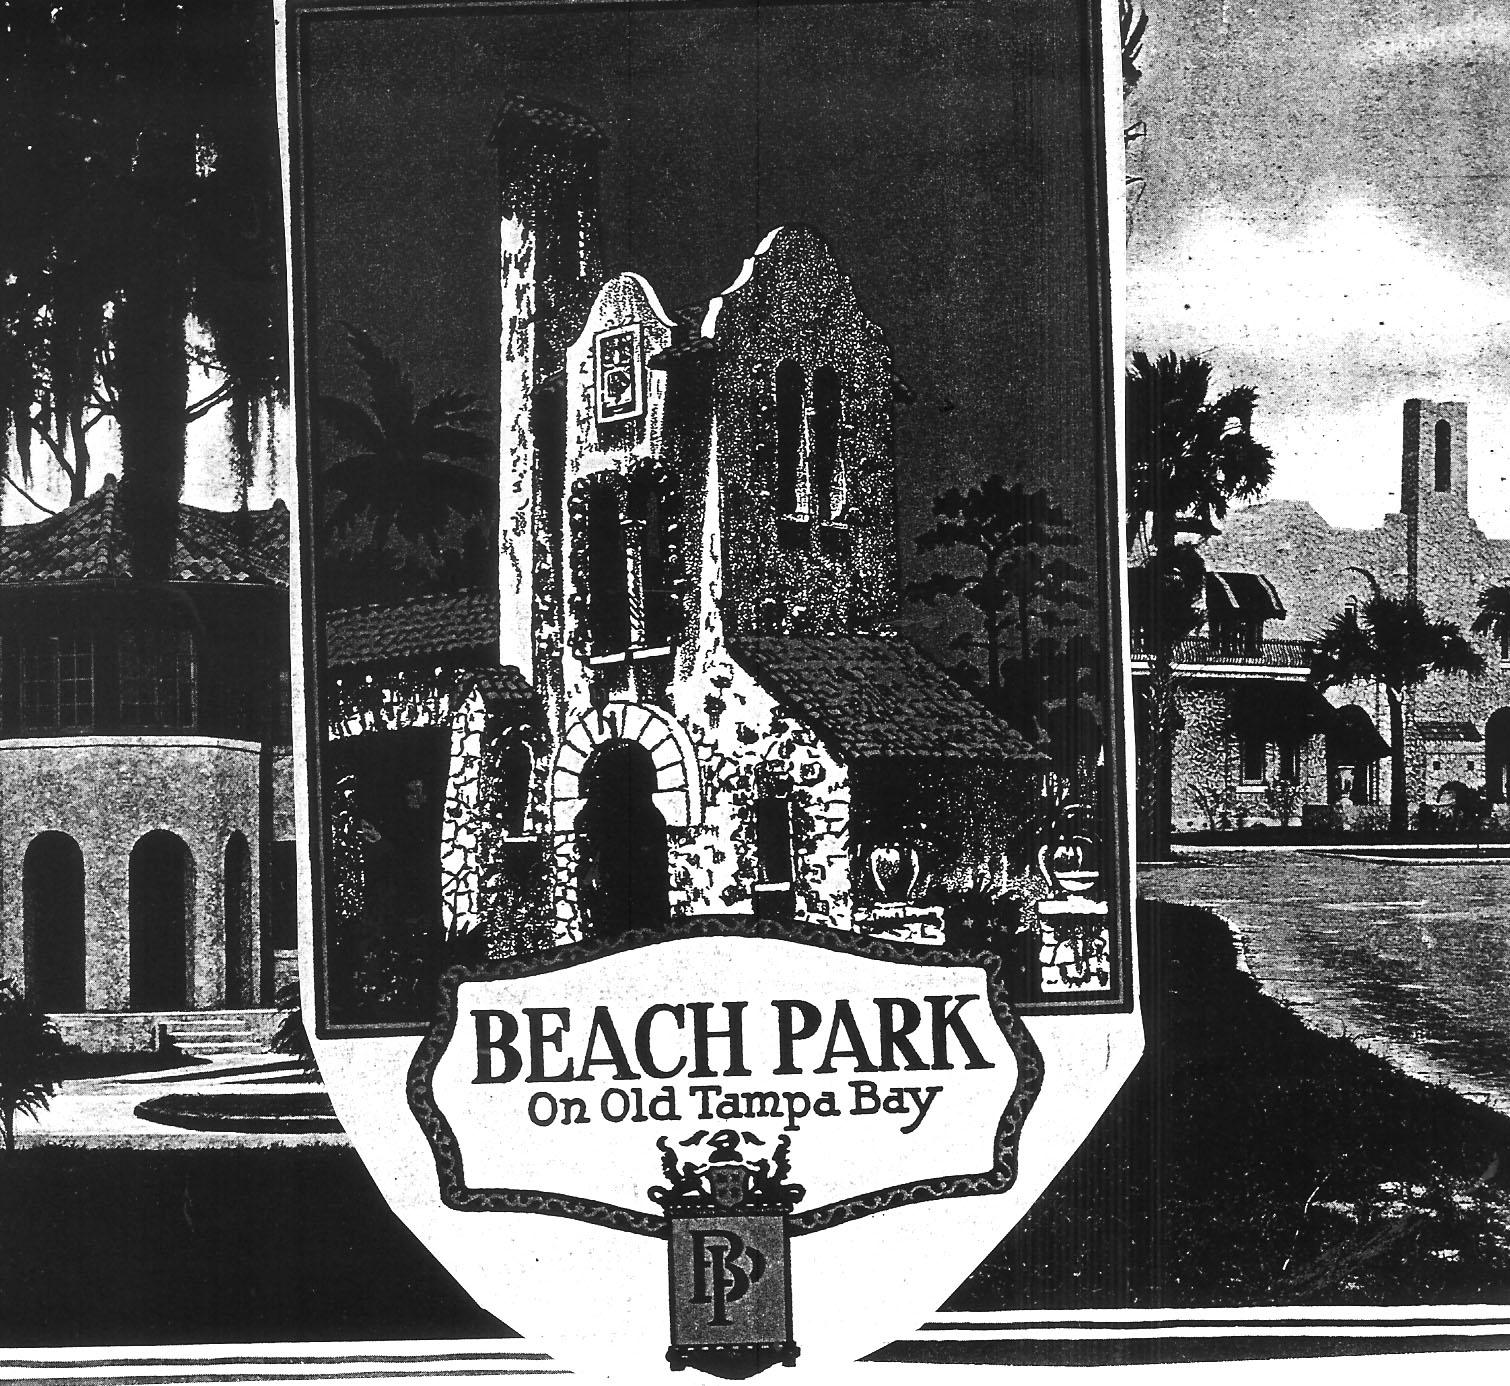 Beach Park Ad The Florida Boom